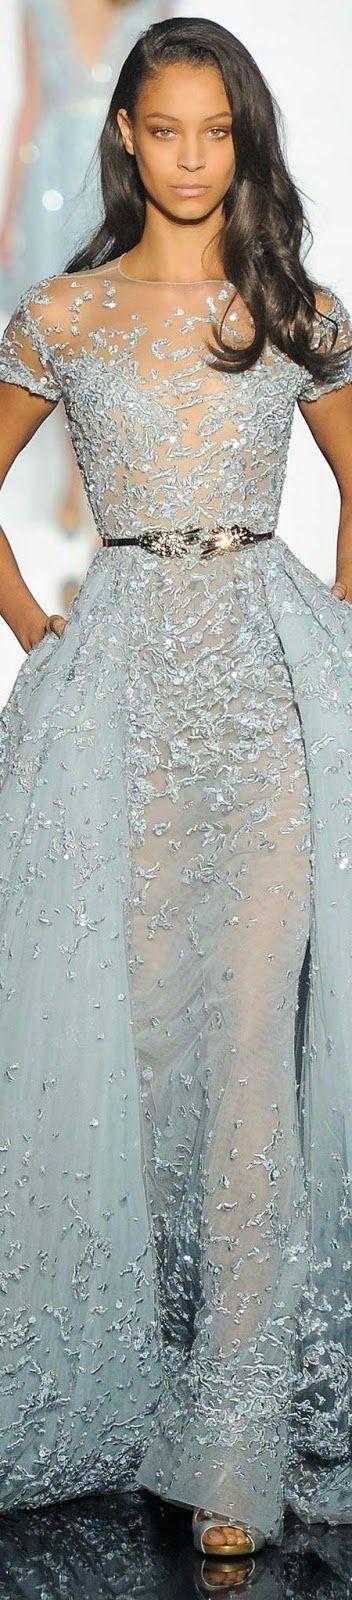 Beautiful Light Blue Designer Dress